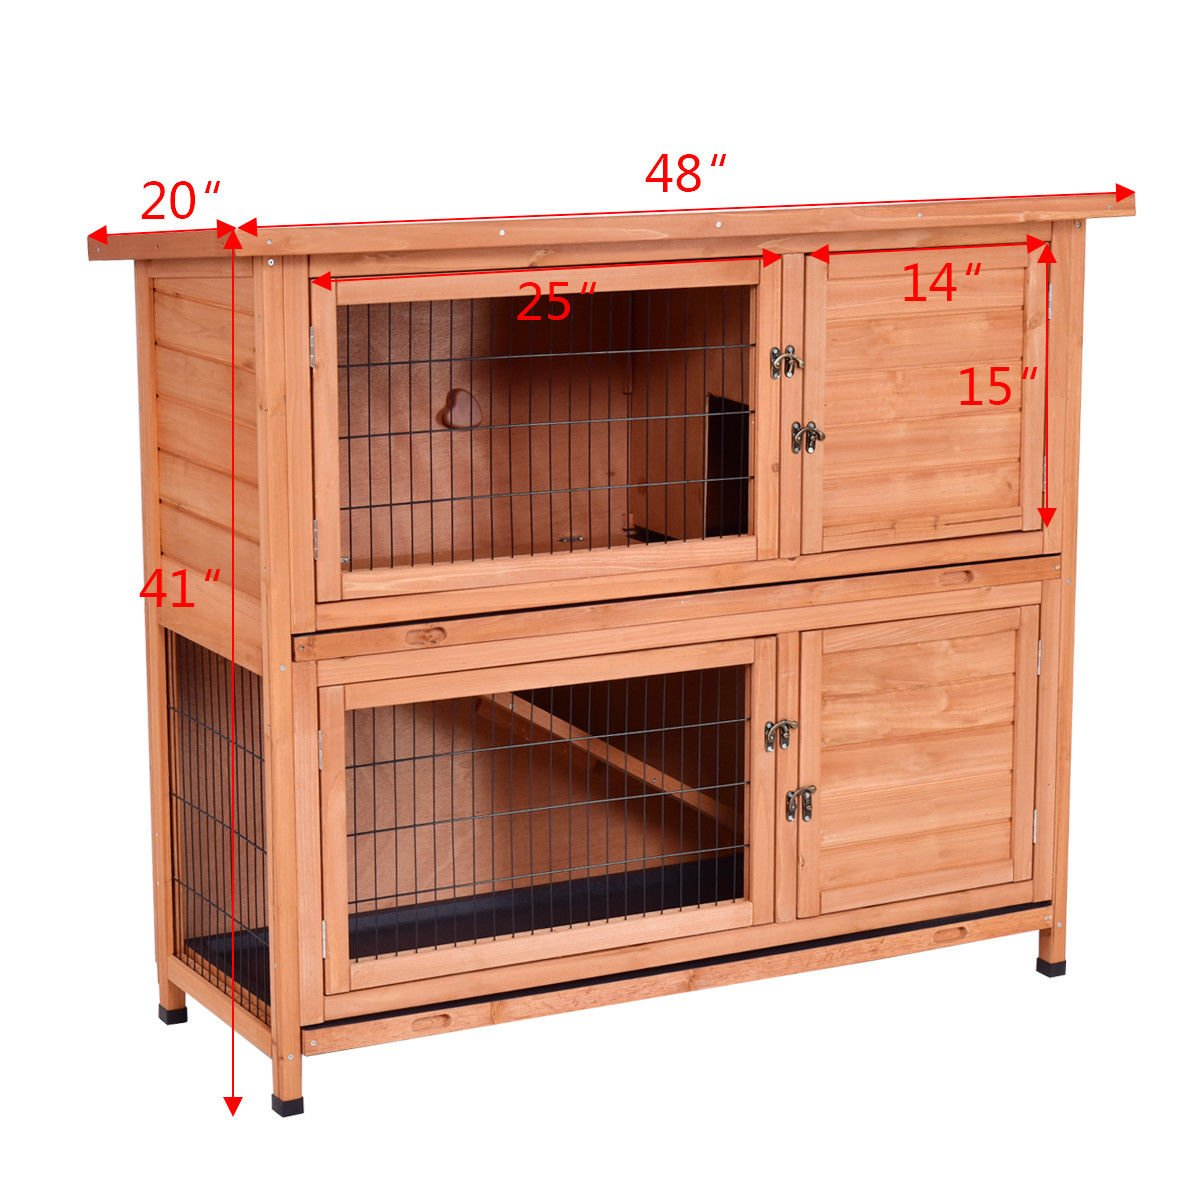 Tangkula Chicken Coop 48'' Rabbit Hutch Wooden Garden Backyard Bunny Hen House Pet Supplies with Ladder by Tangkula (Image #5)